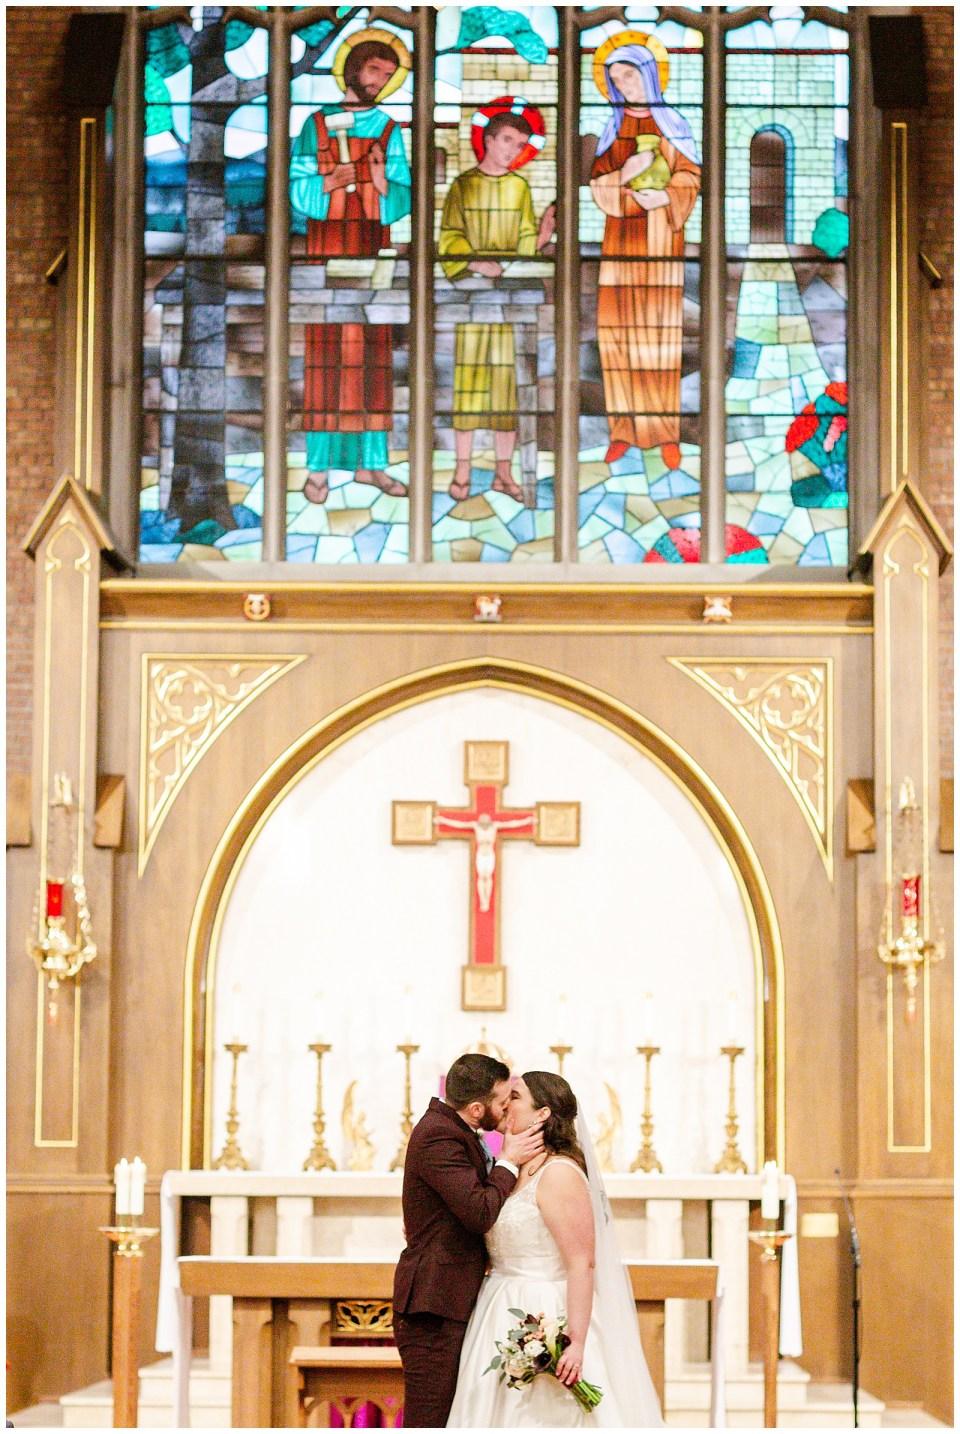 Catholic wedding at Holy Family Catholic Church in St. Louis Park, MN during the coronavirus COVID-19 season